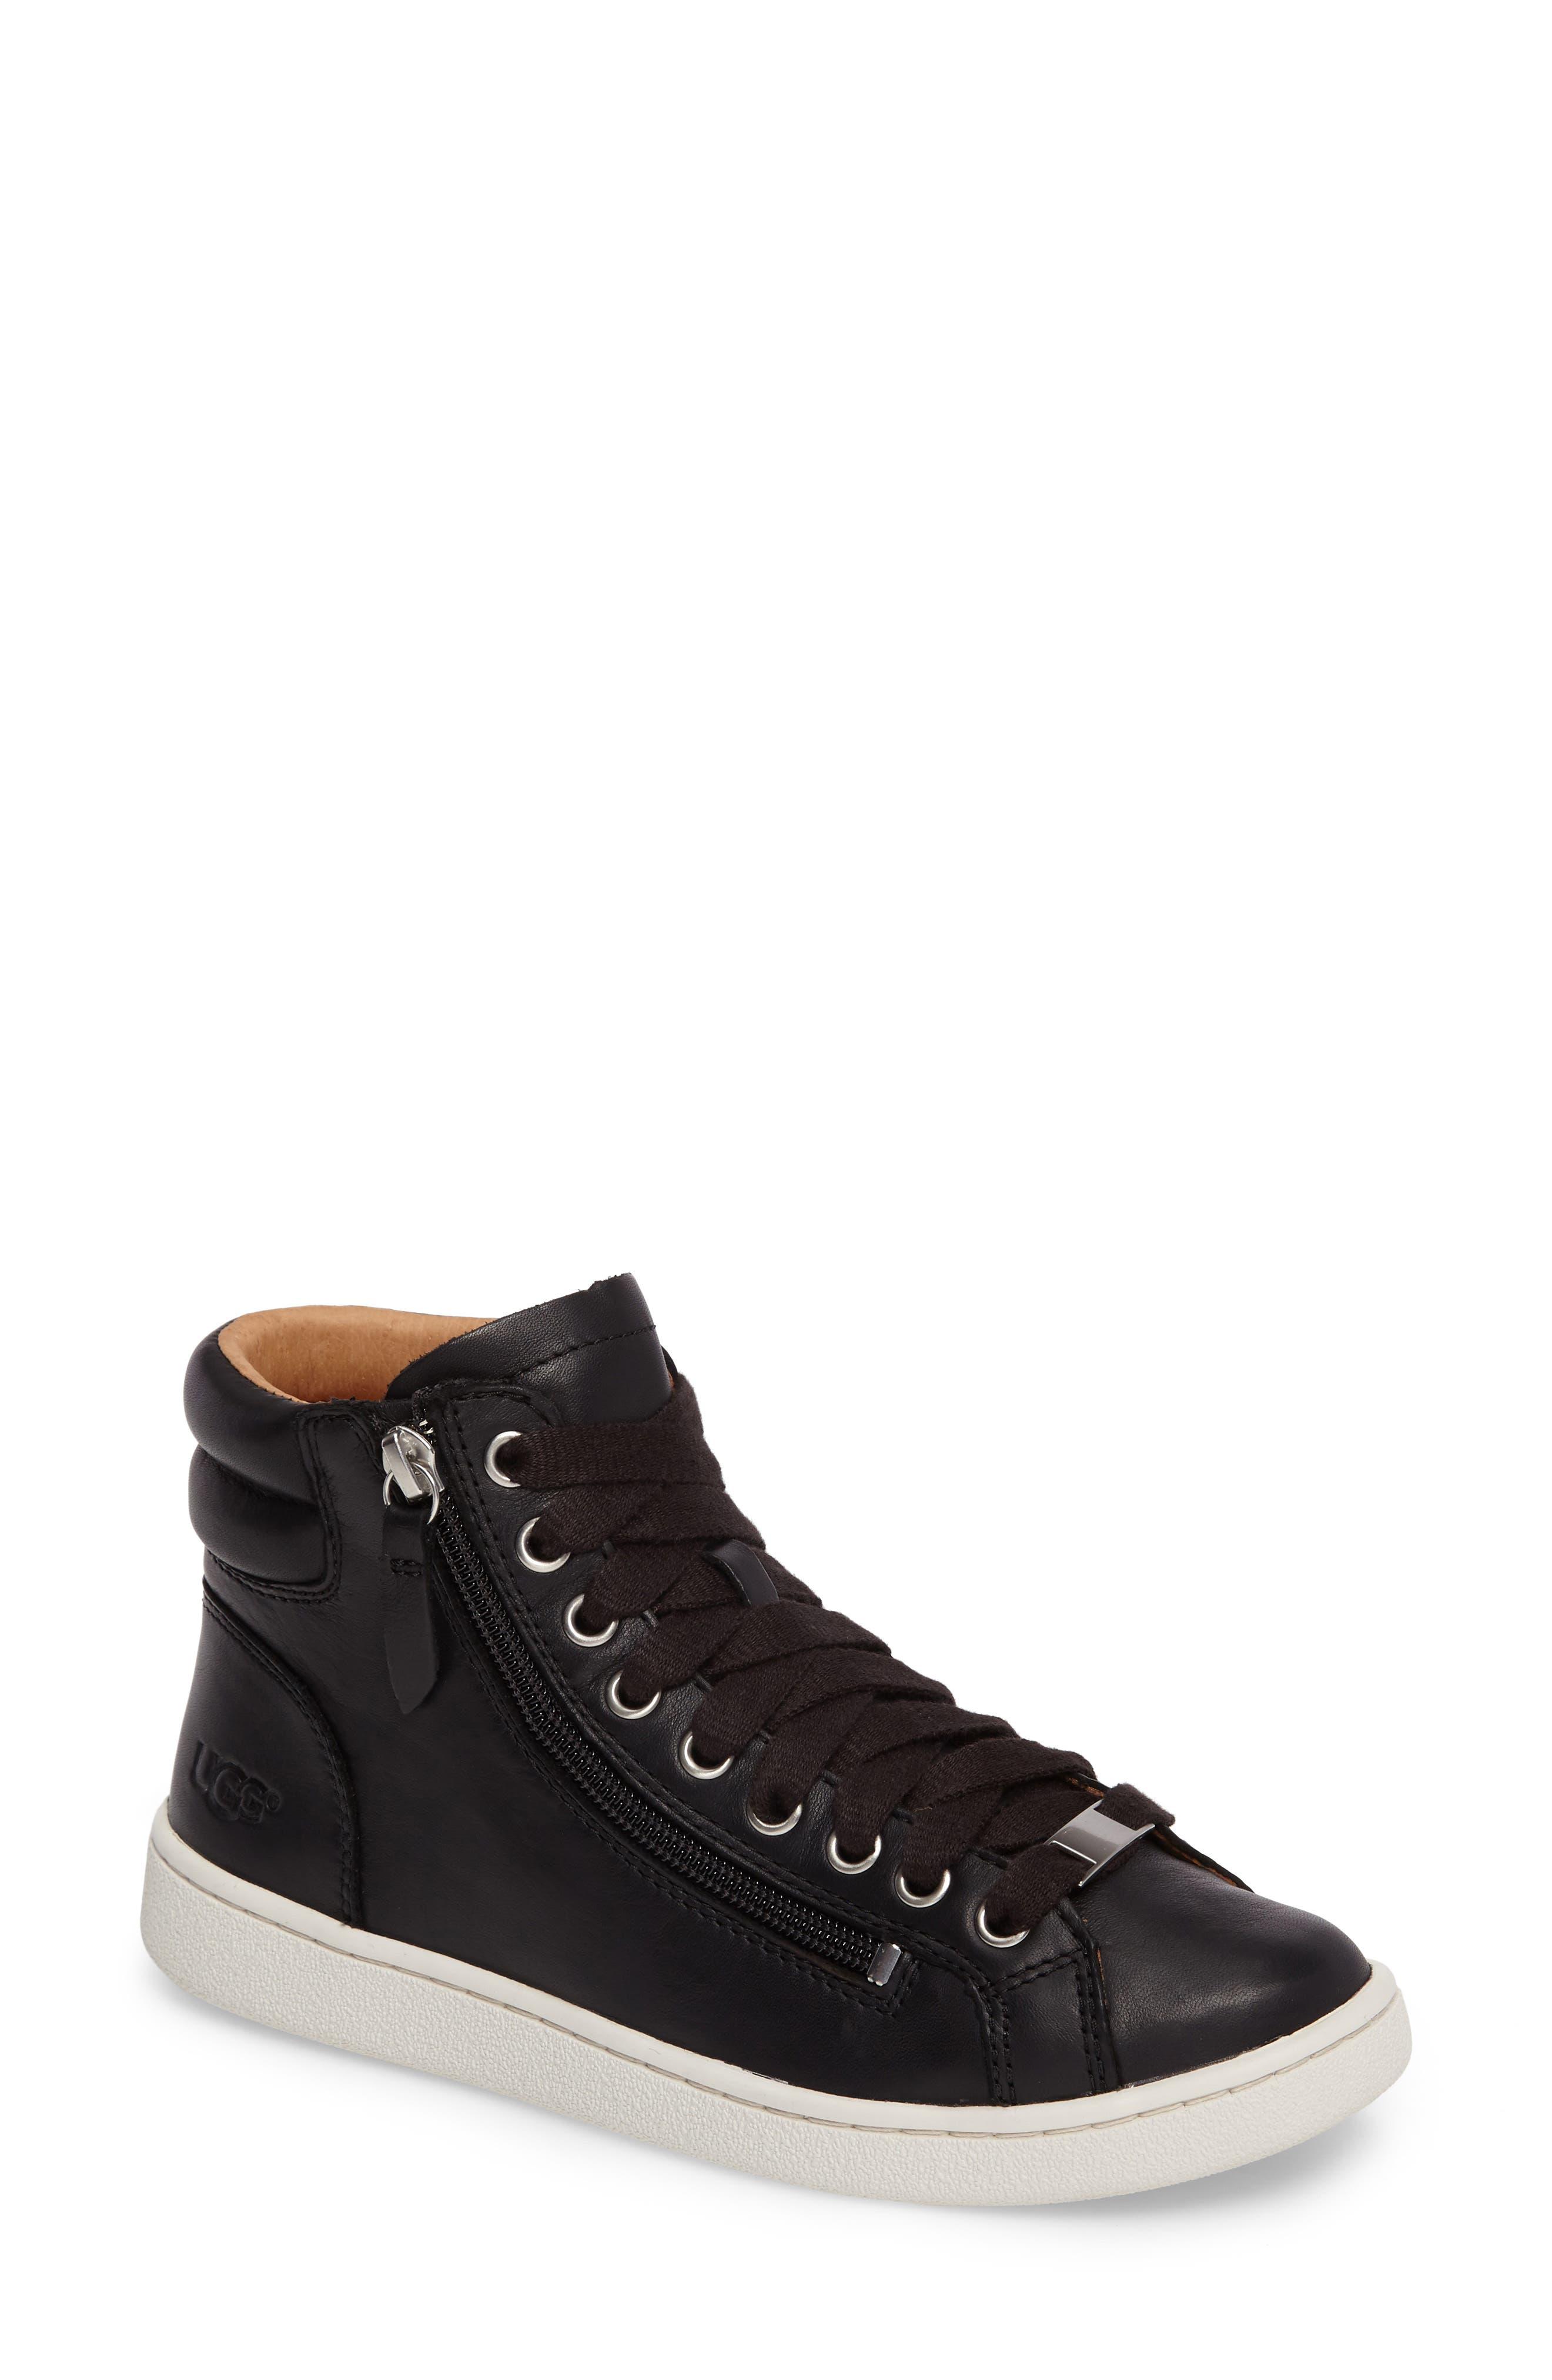 UGG<SUP>®</SUP> UGG Olive High Top Sneaker, Main, color, BLACK LEATHER